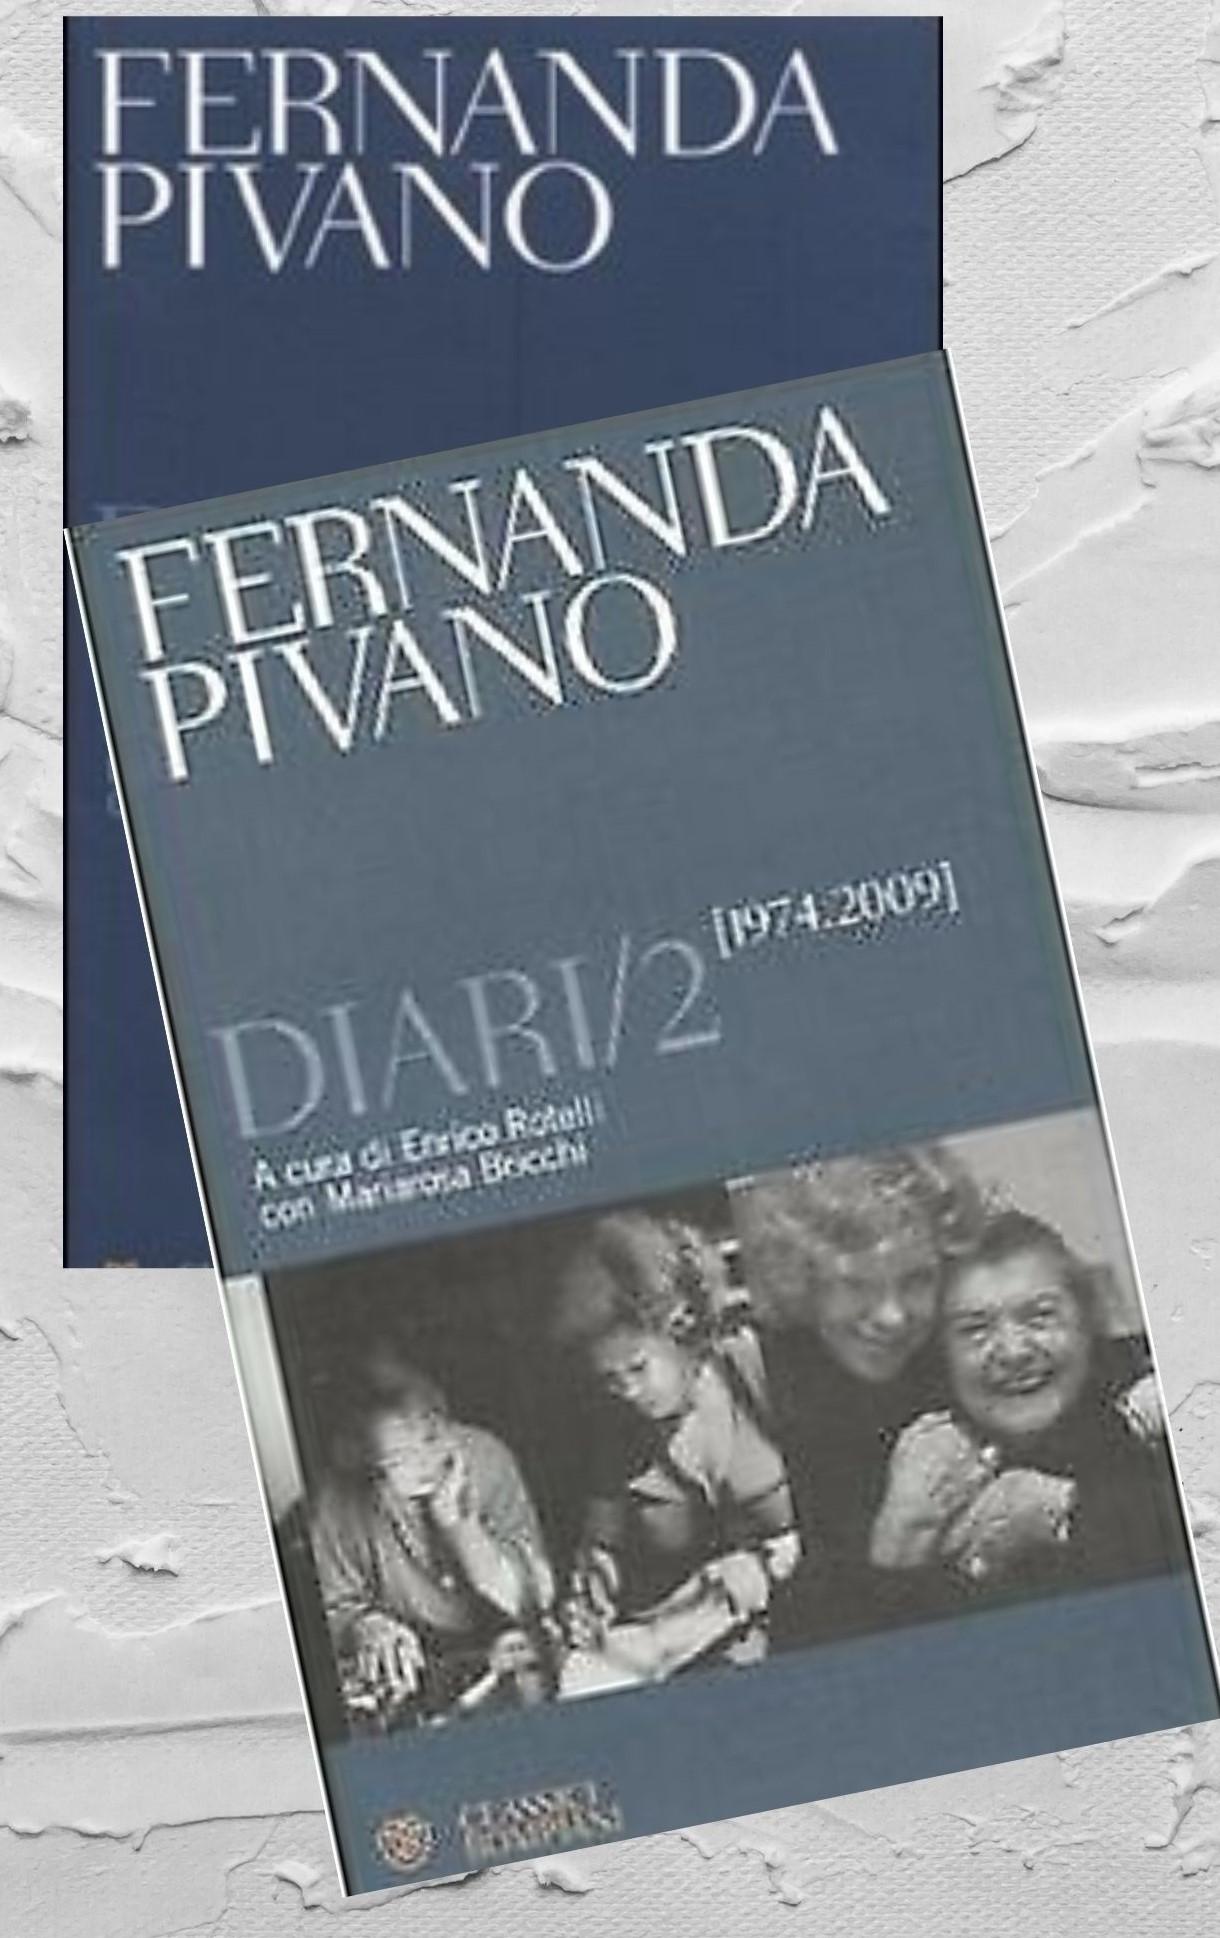 Quando a Porta Portese presi i due diari di Fernanda Pivano a 60 euro